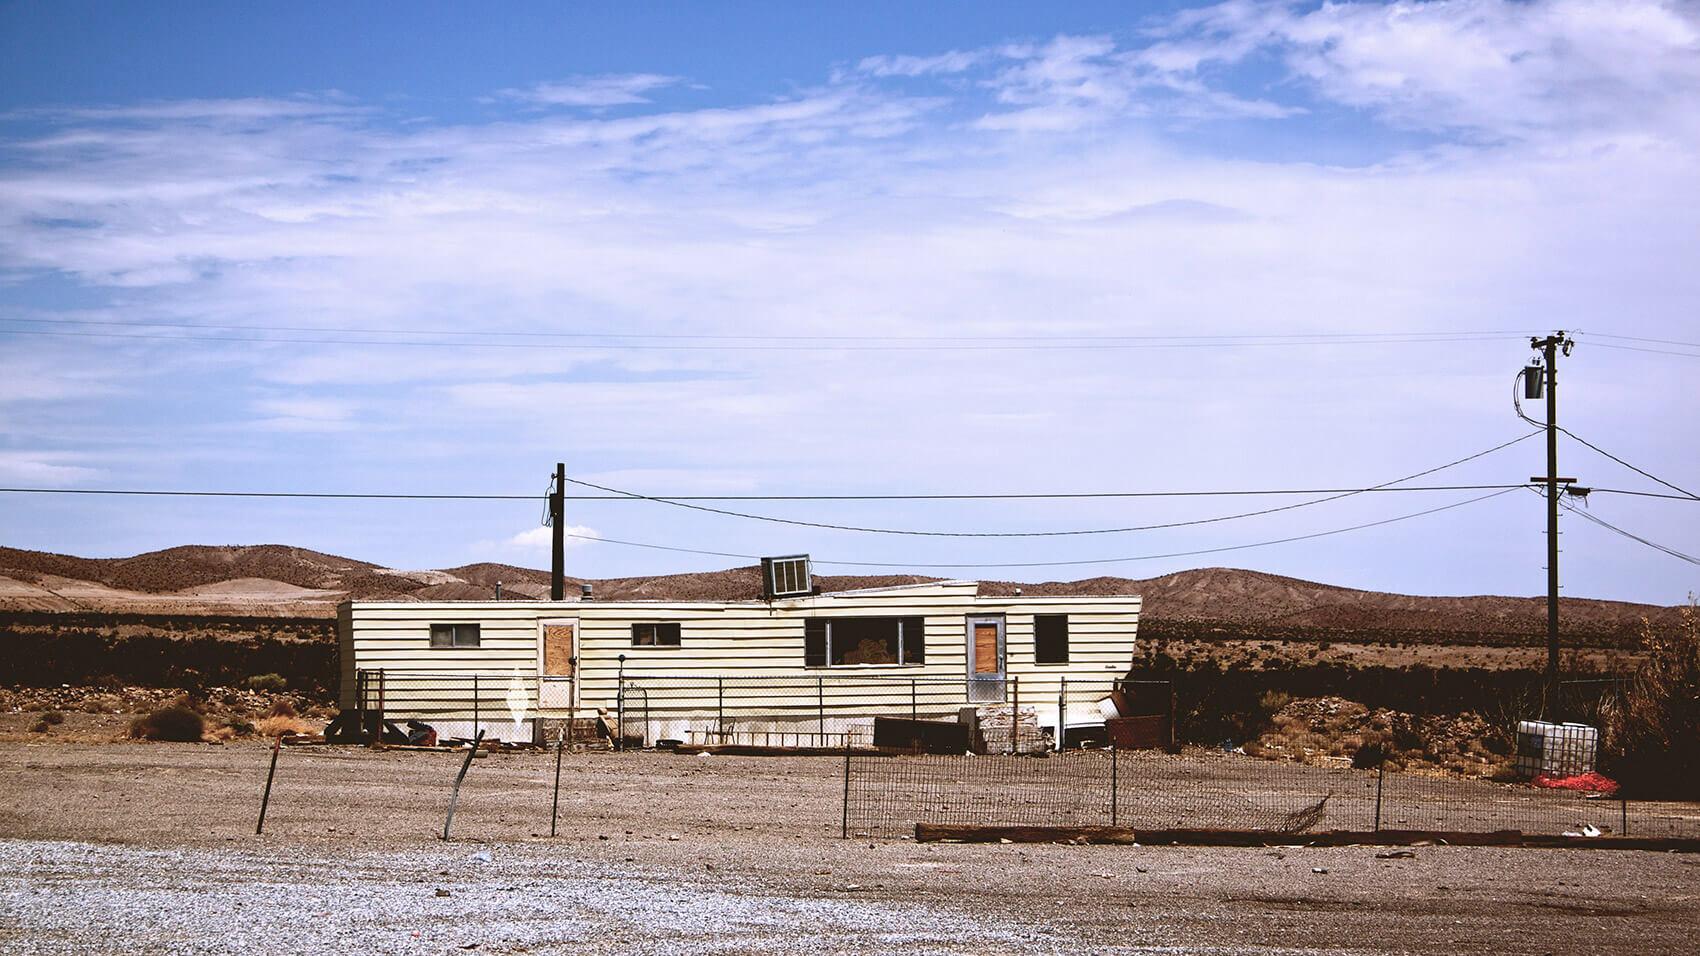 Life in the Arizona desert